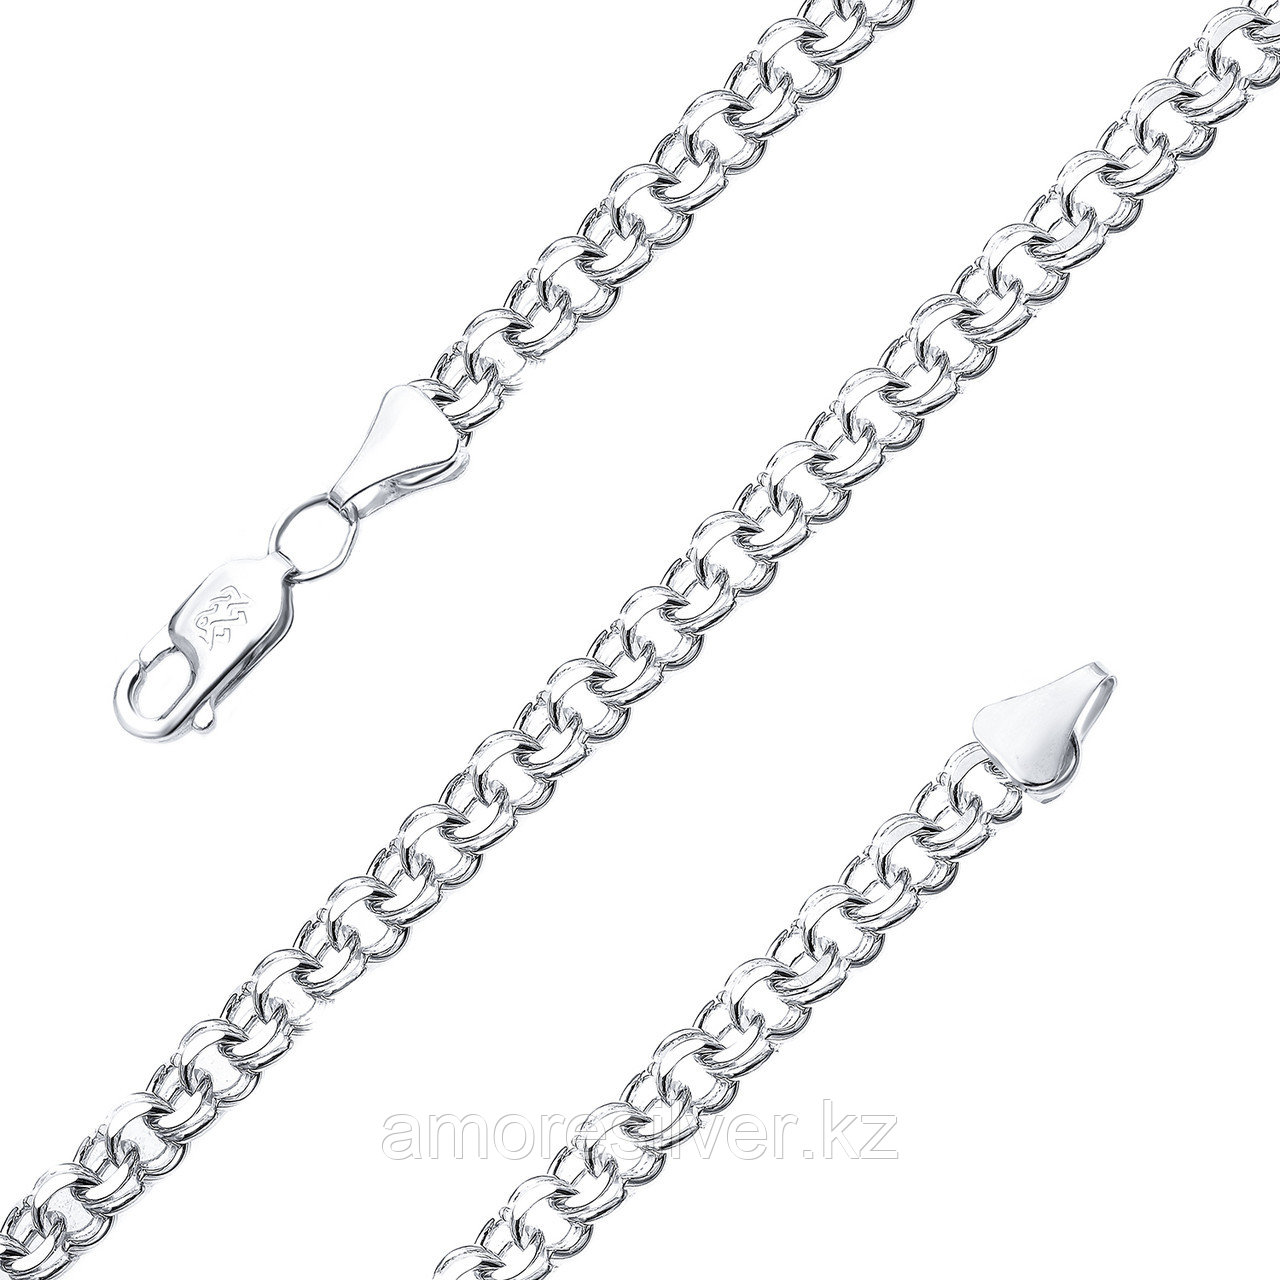 Цепь Адамант серебро с родием, без вставок Ср925Р-107007060